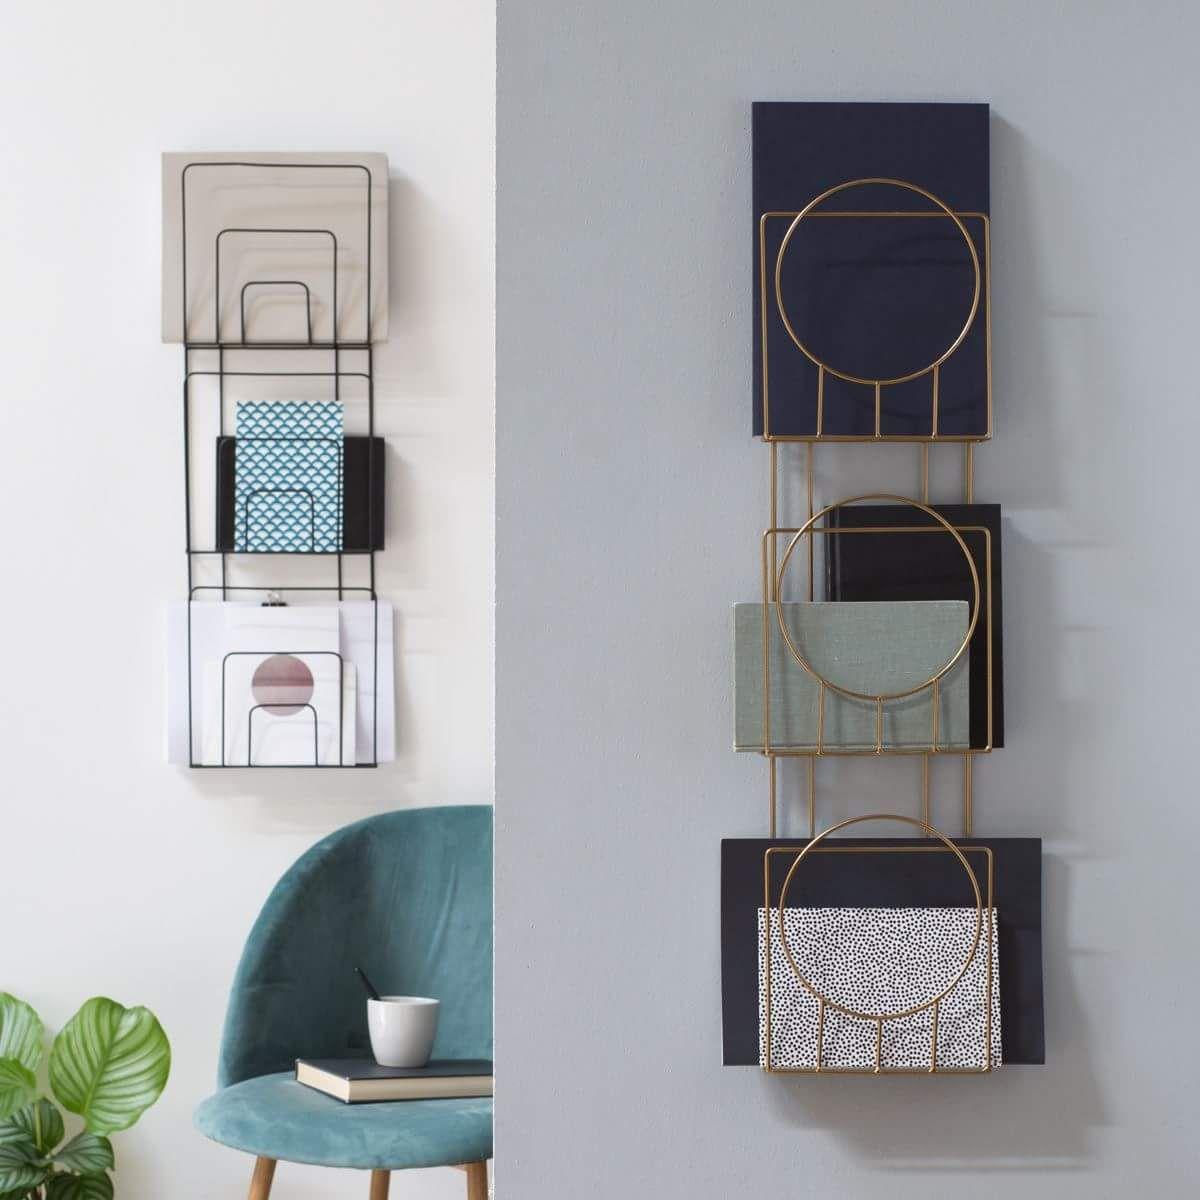 Amusing Living Room Kadıköy Ideas - Plan 3D house - goles.us ...